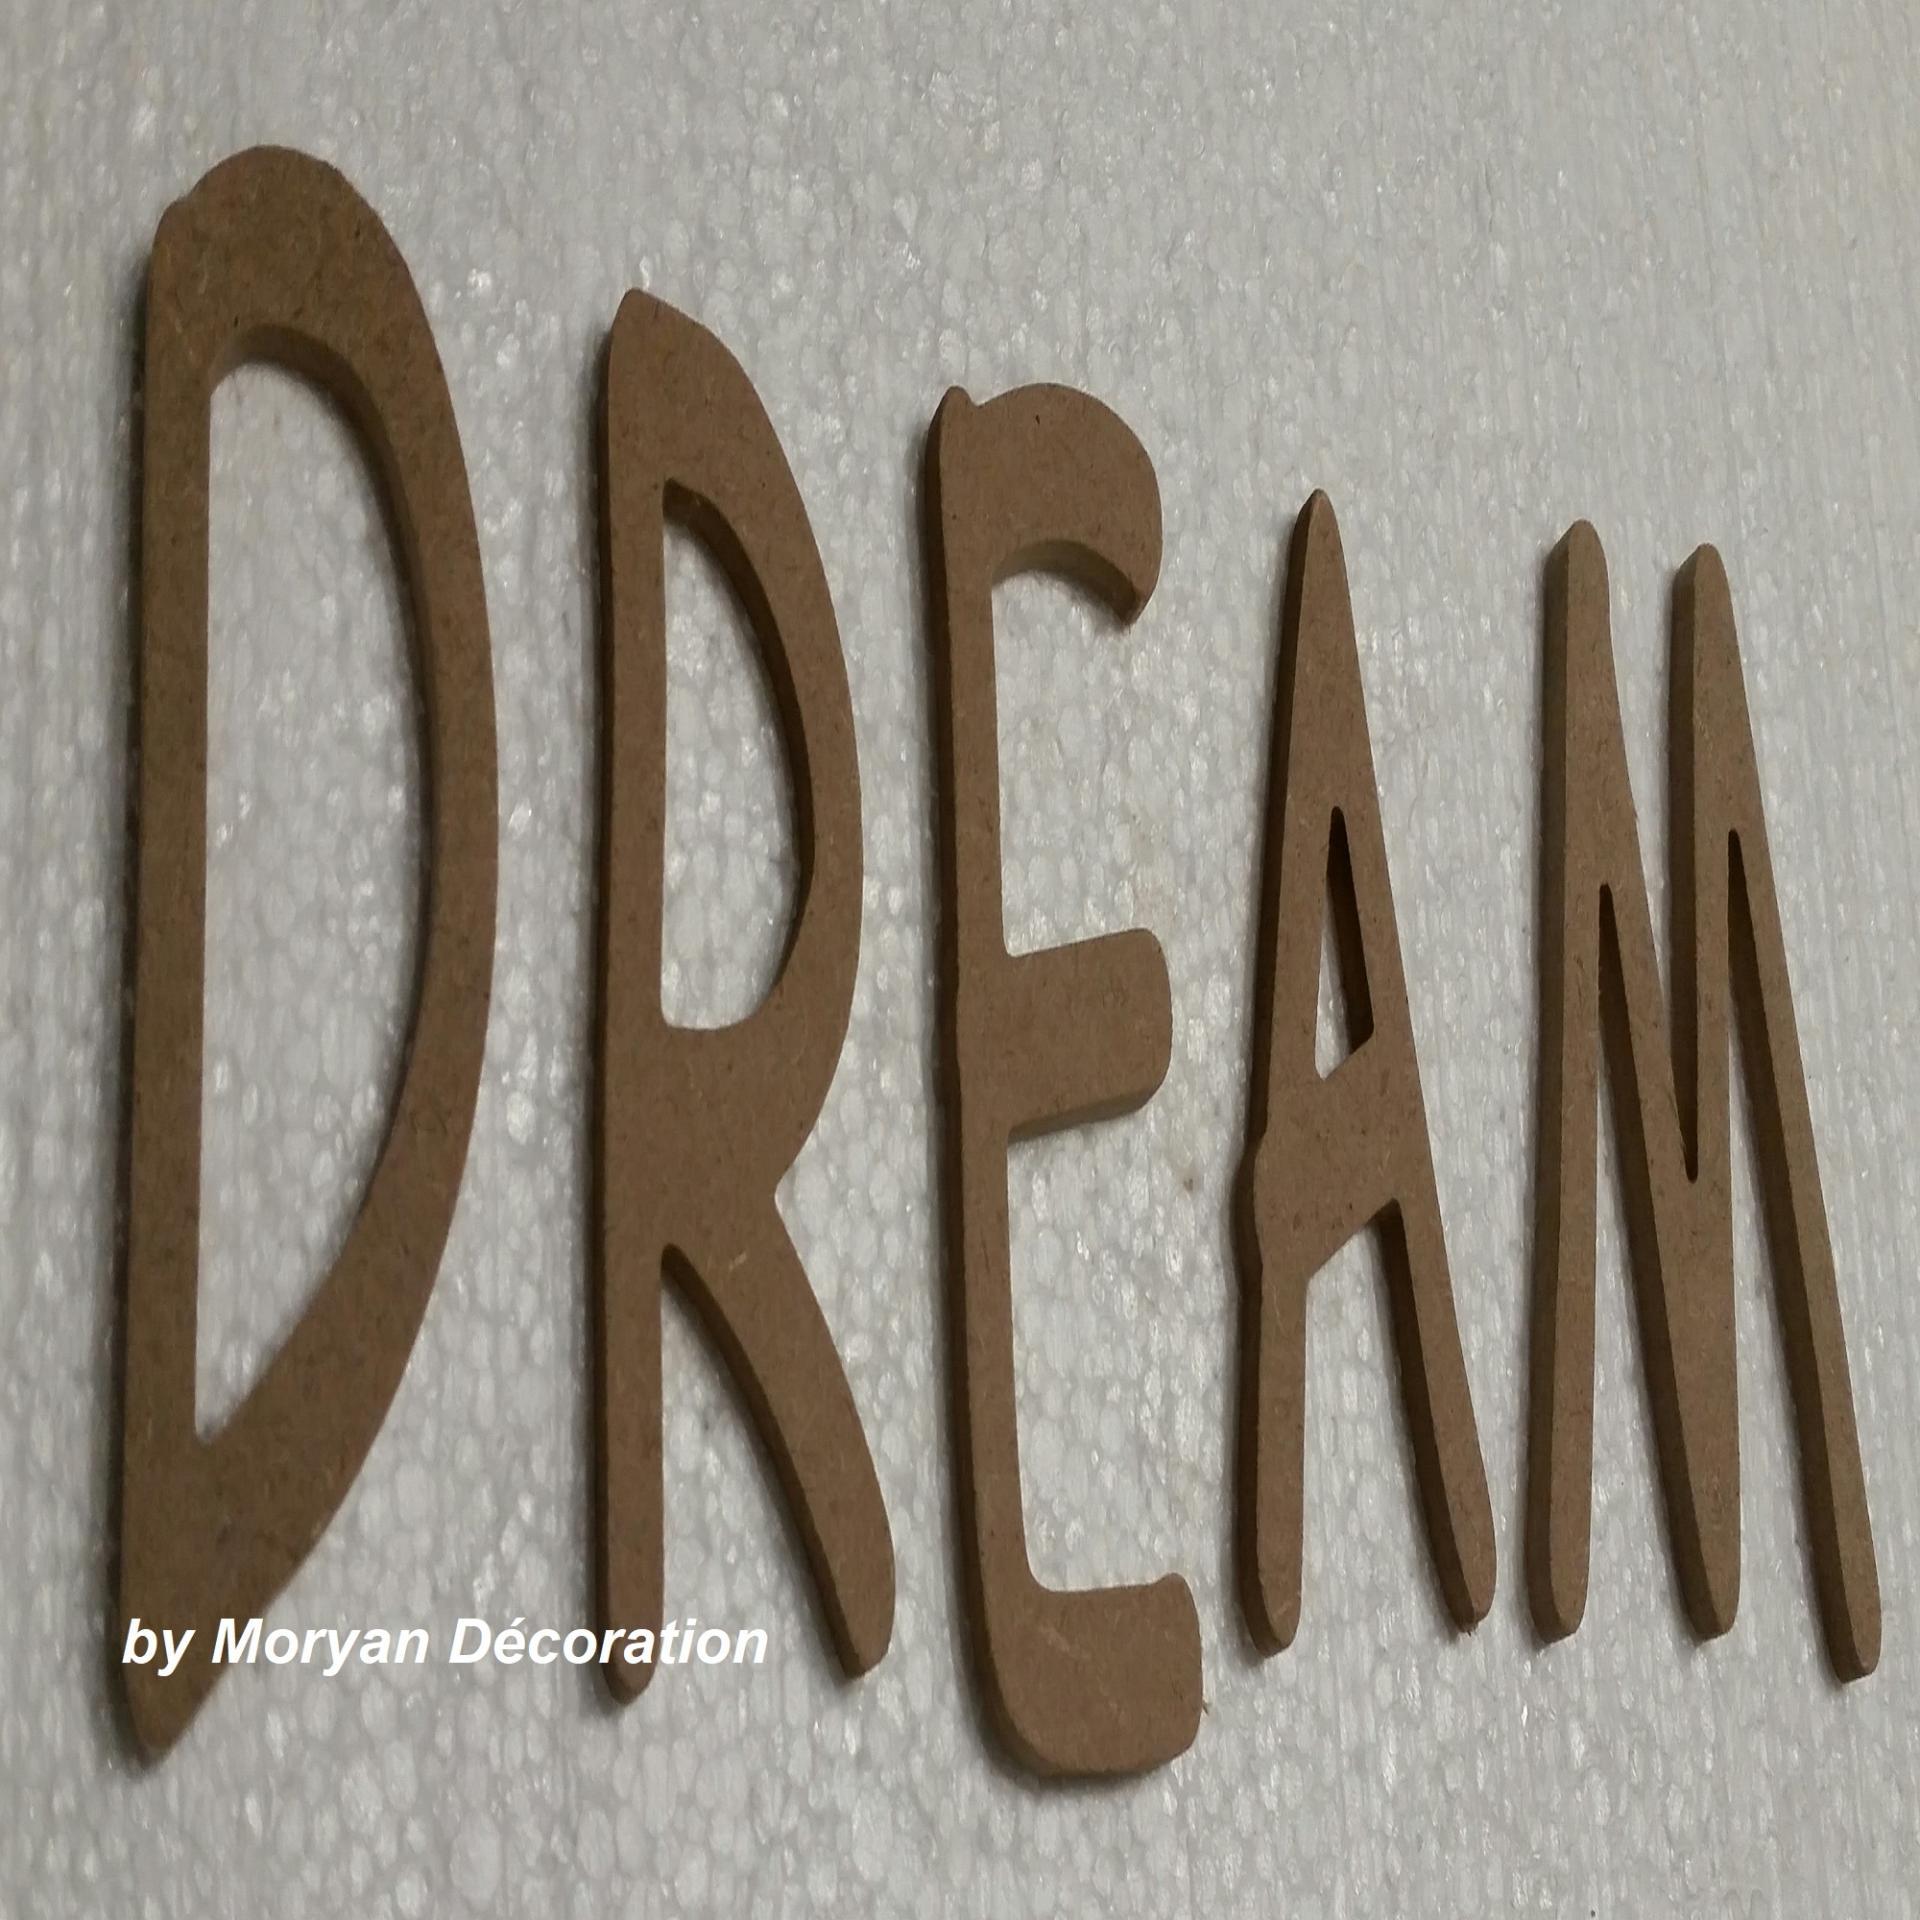 Lettre bois dream 40 cm